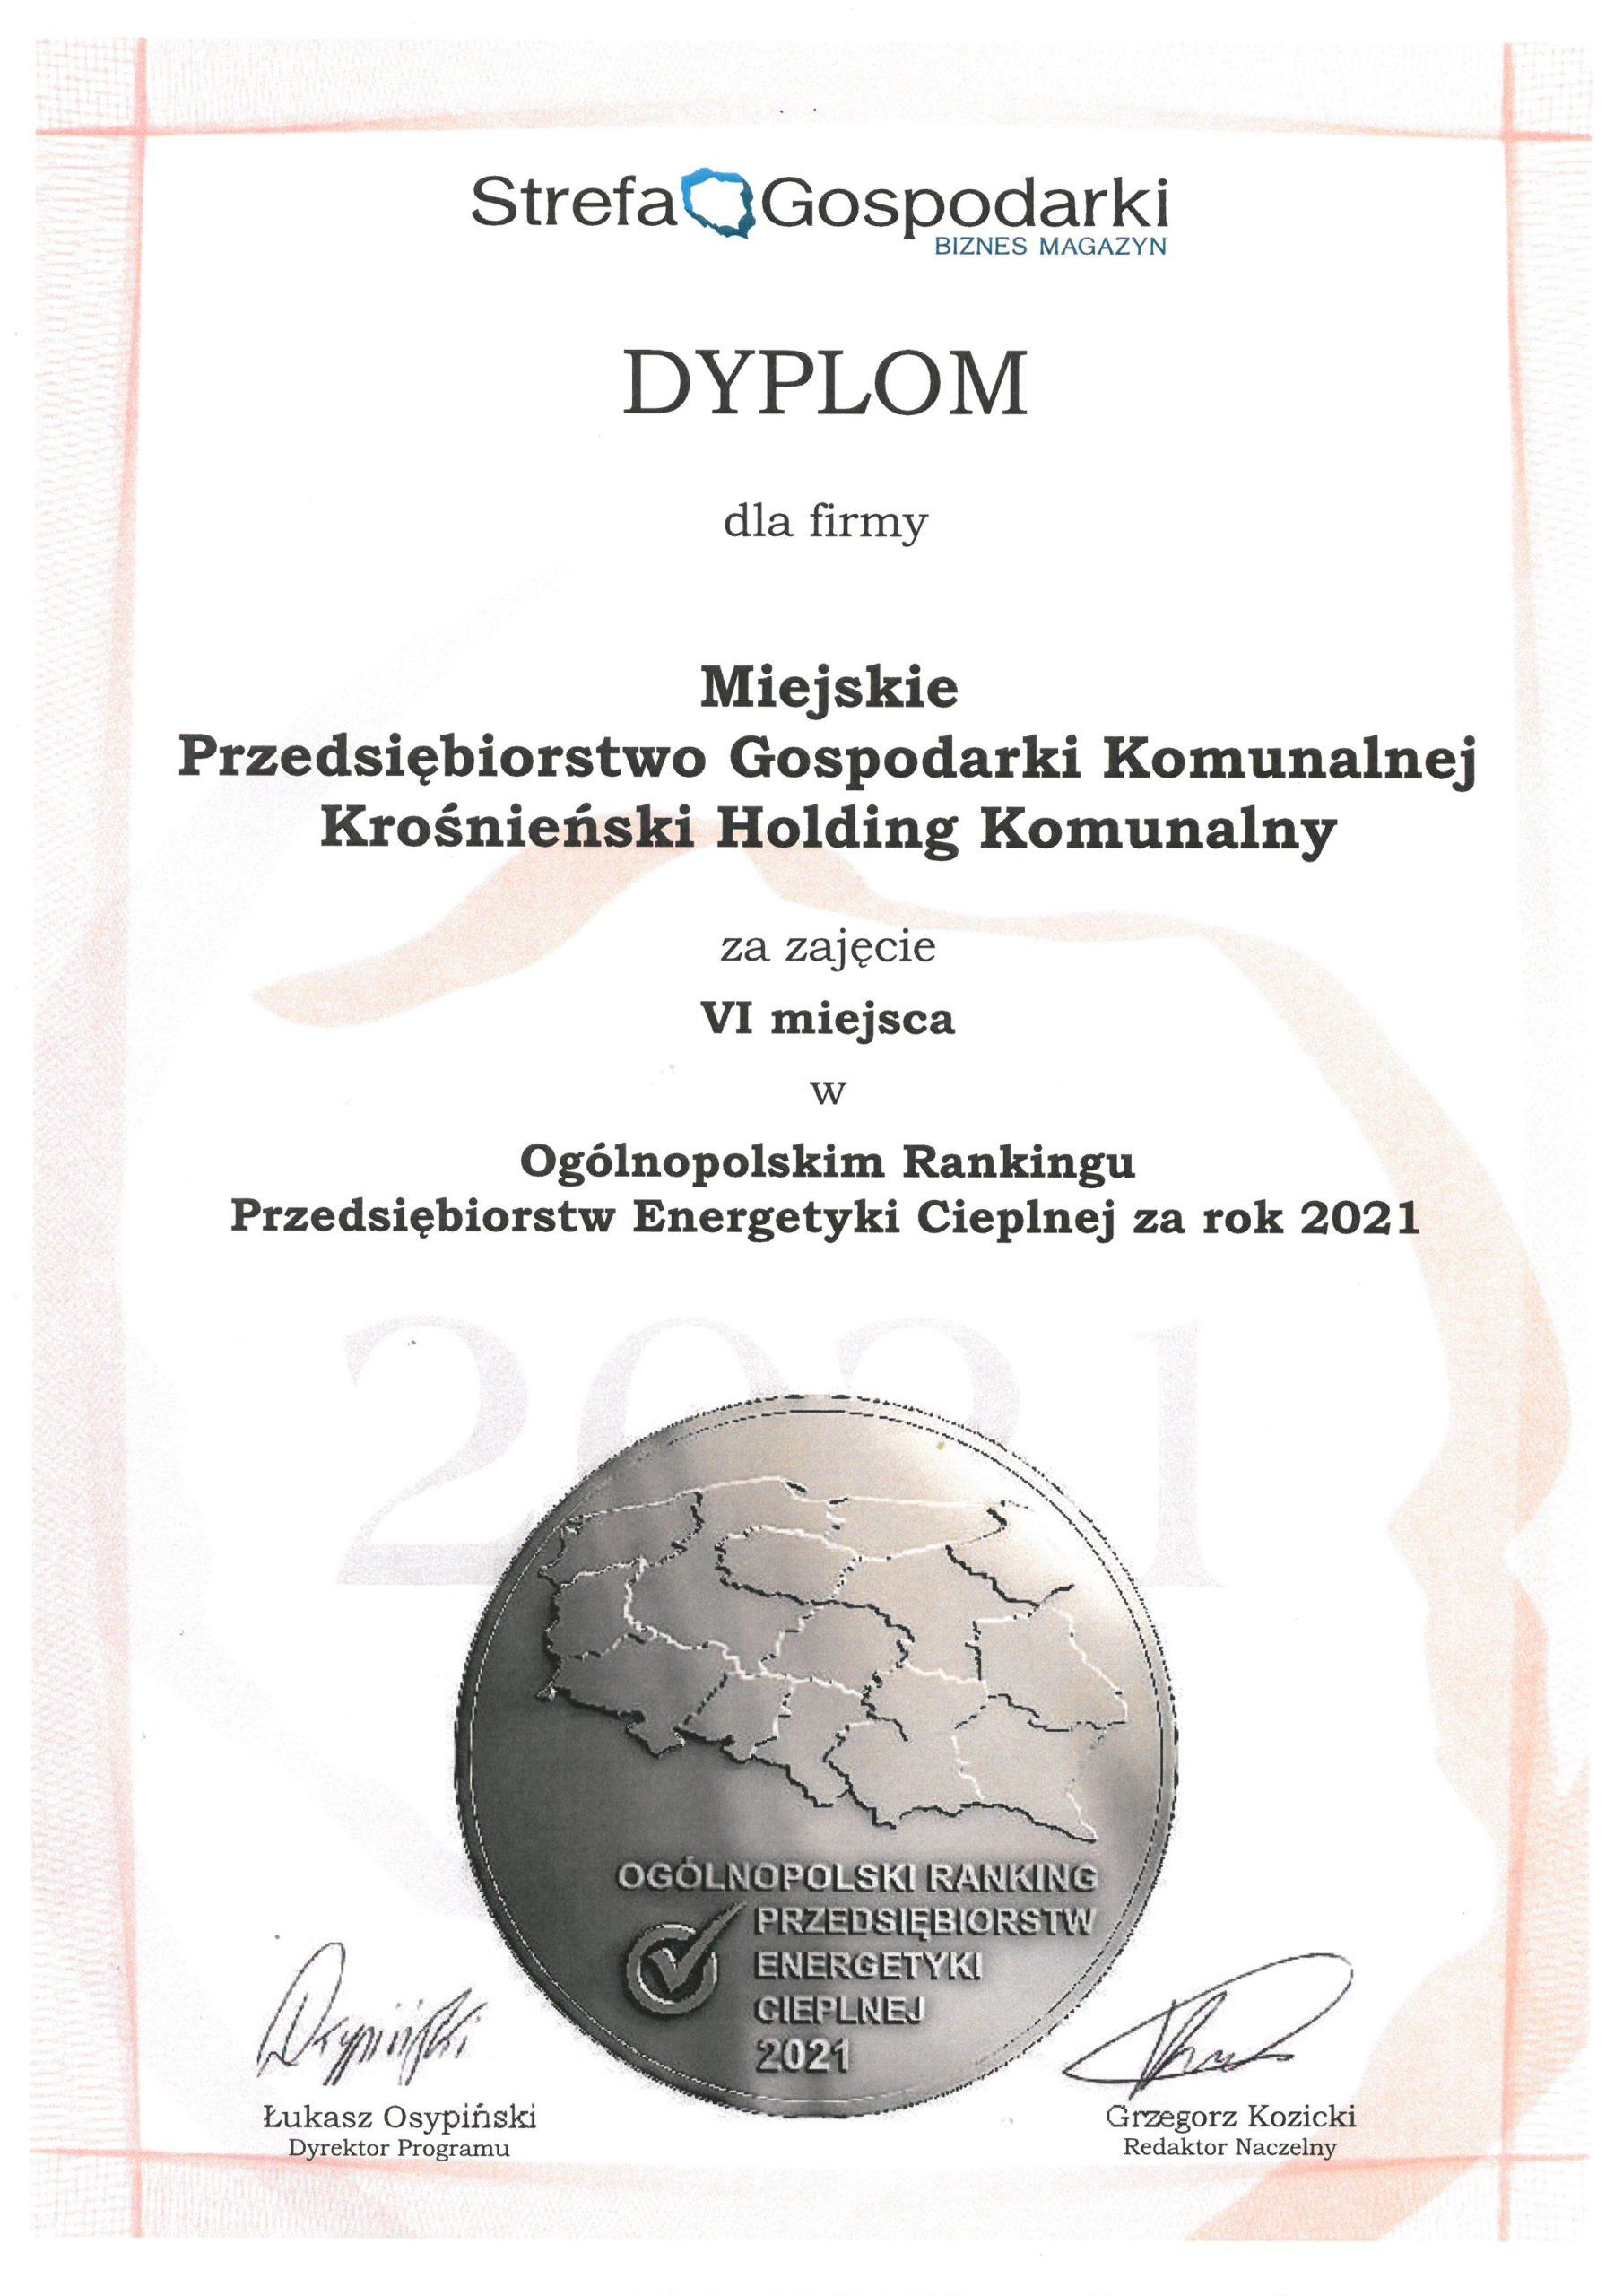 Krośnieński Holding Komunalny